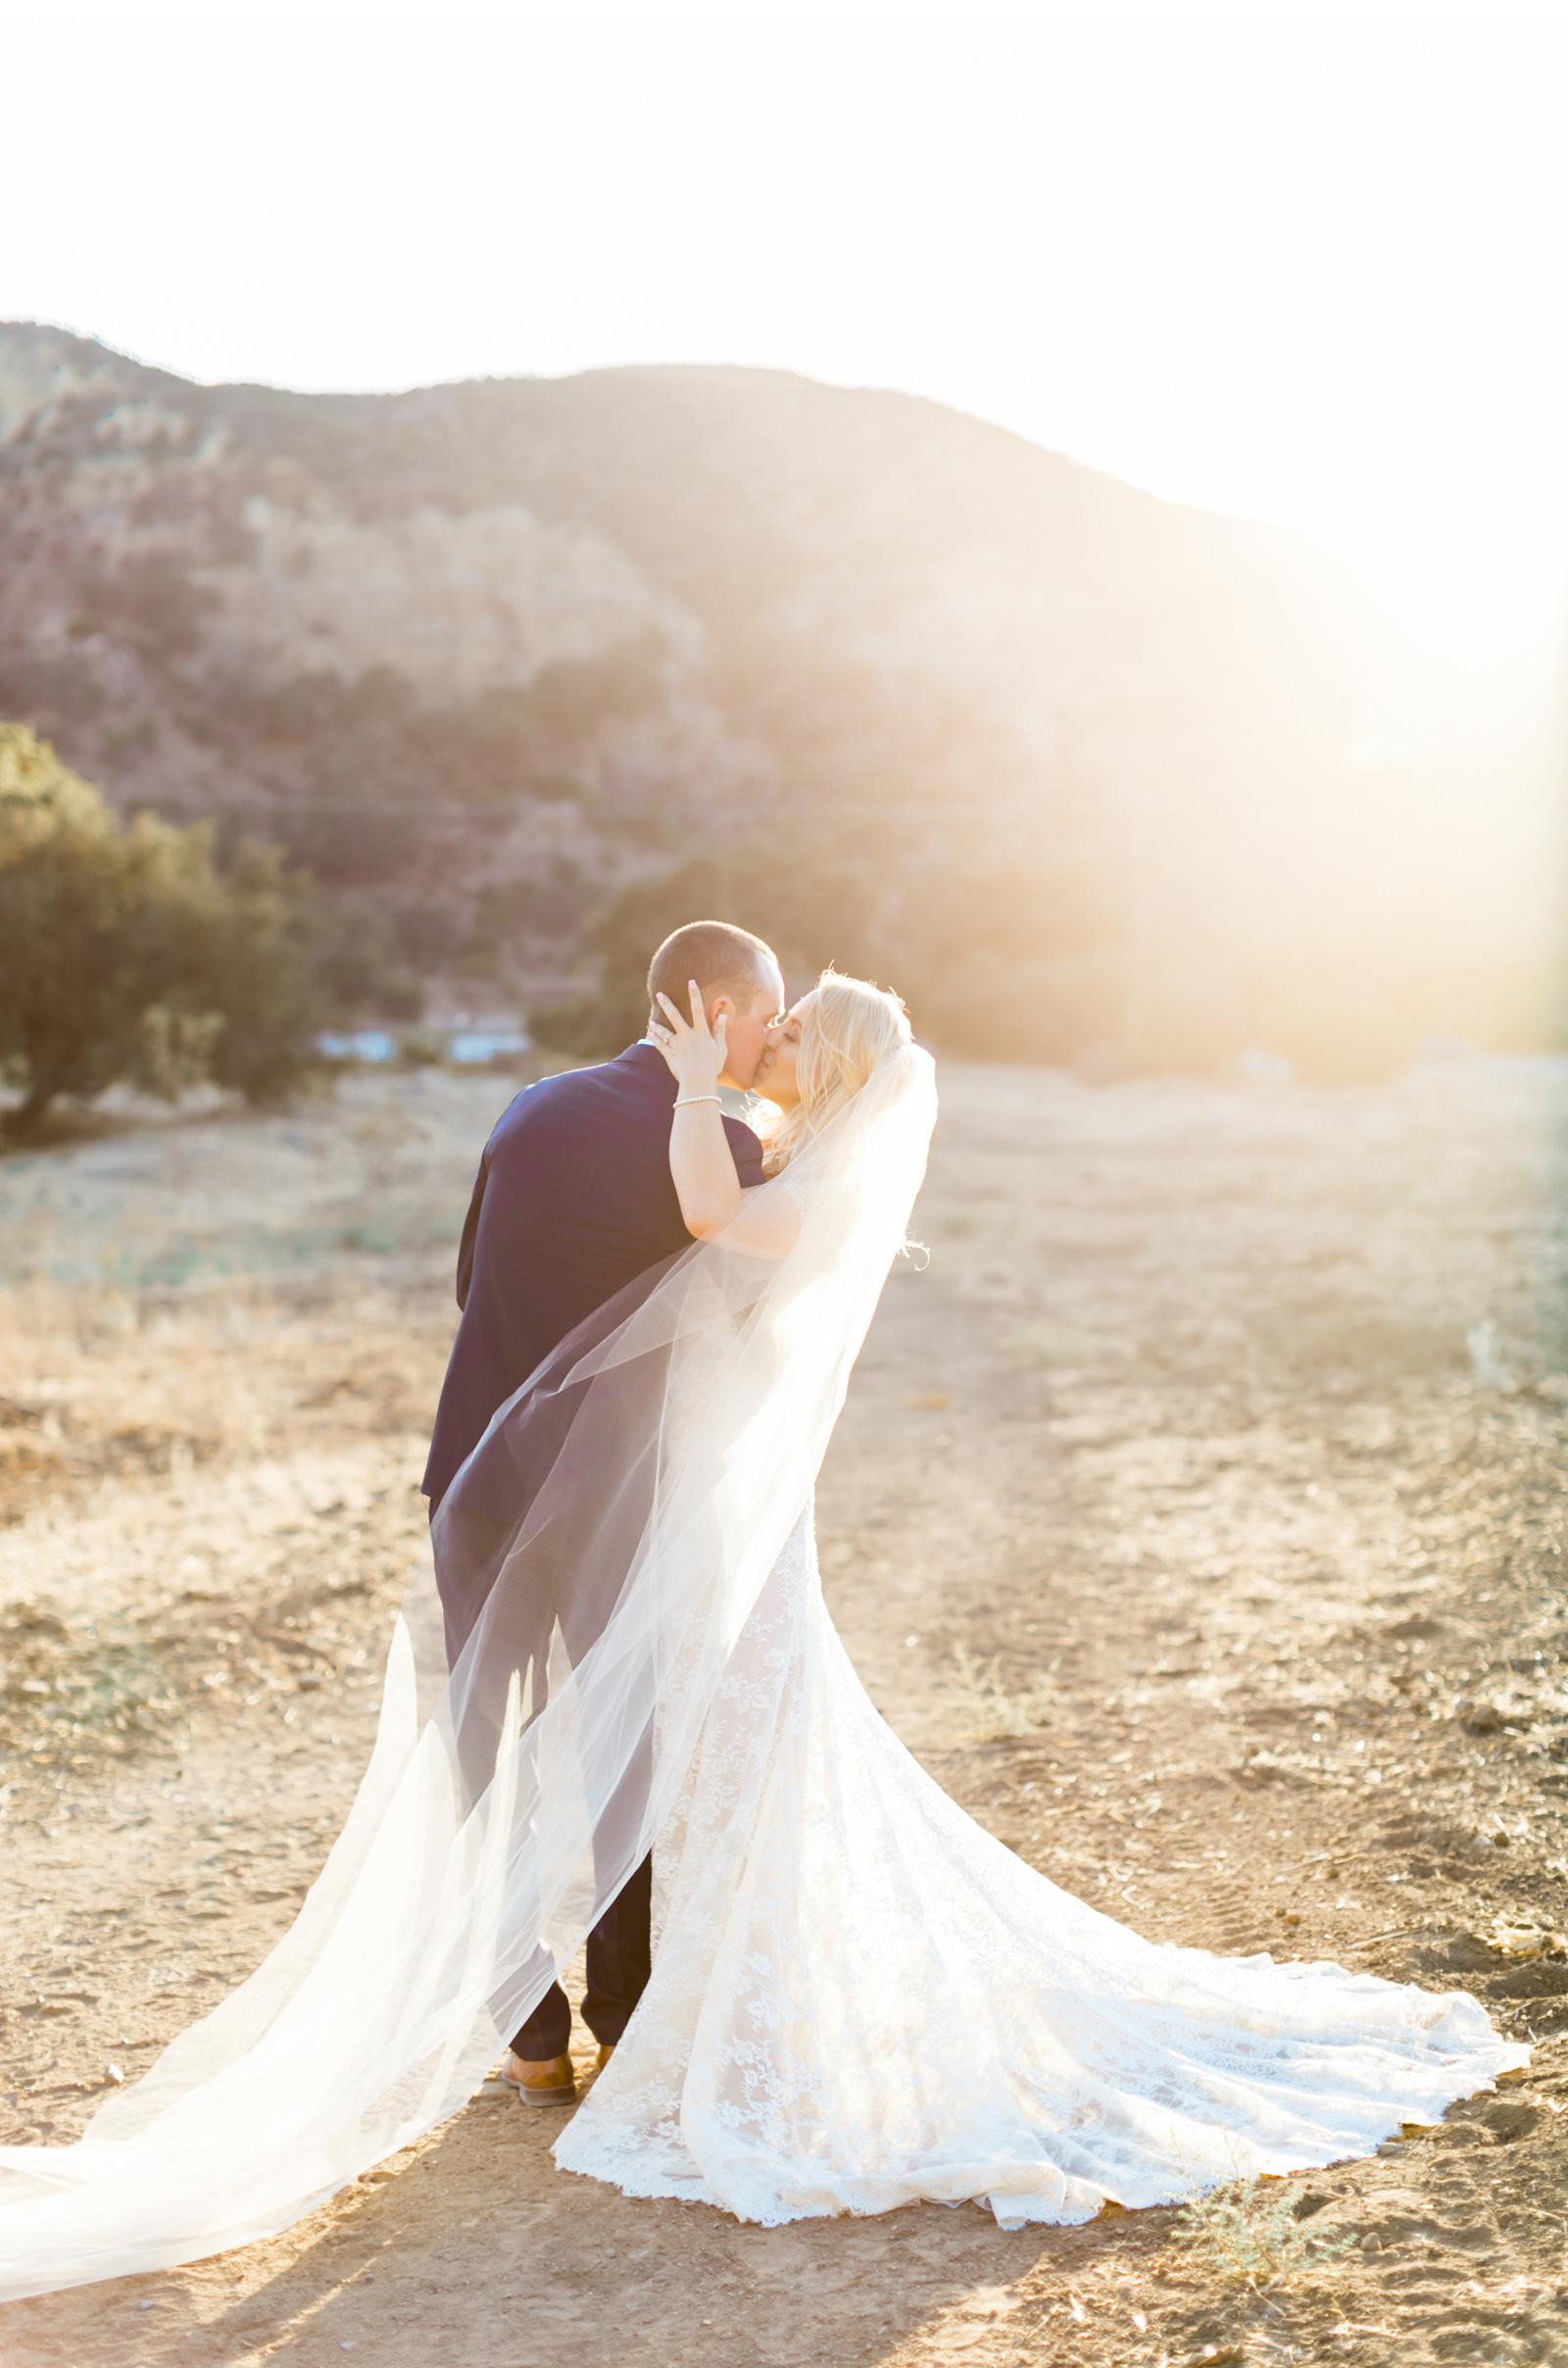 Style-Me-Pretty-Wedding-Photographer-Natalie-Schutt-Photography-Calfornia-San-Luis-Obispo_18.jpg